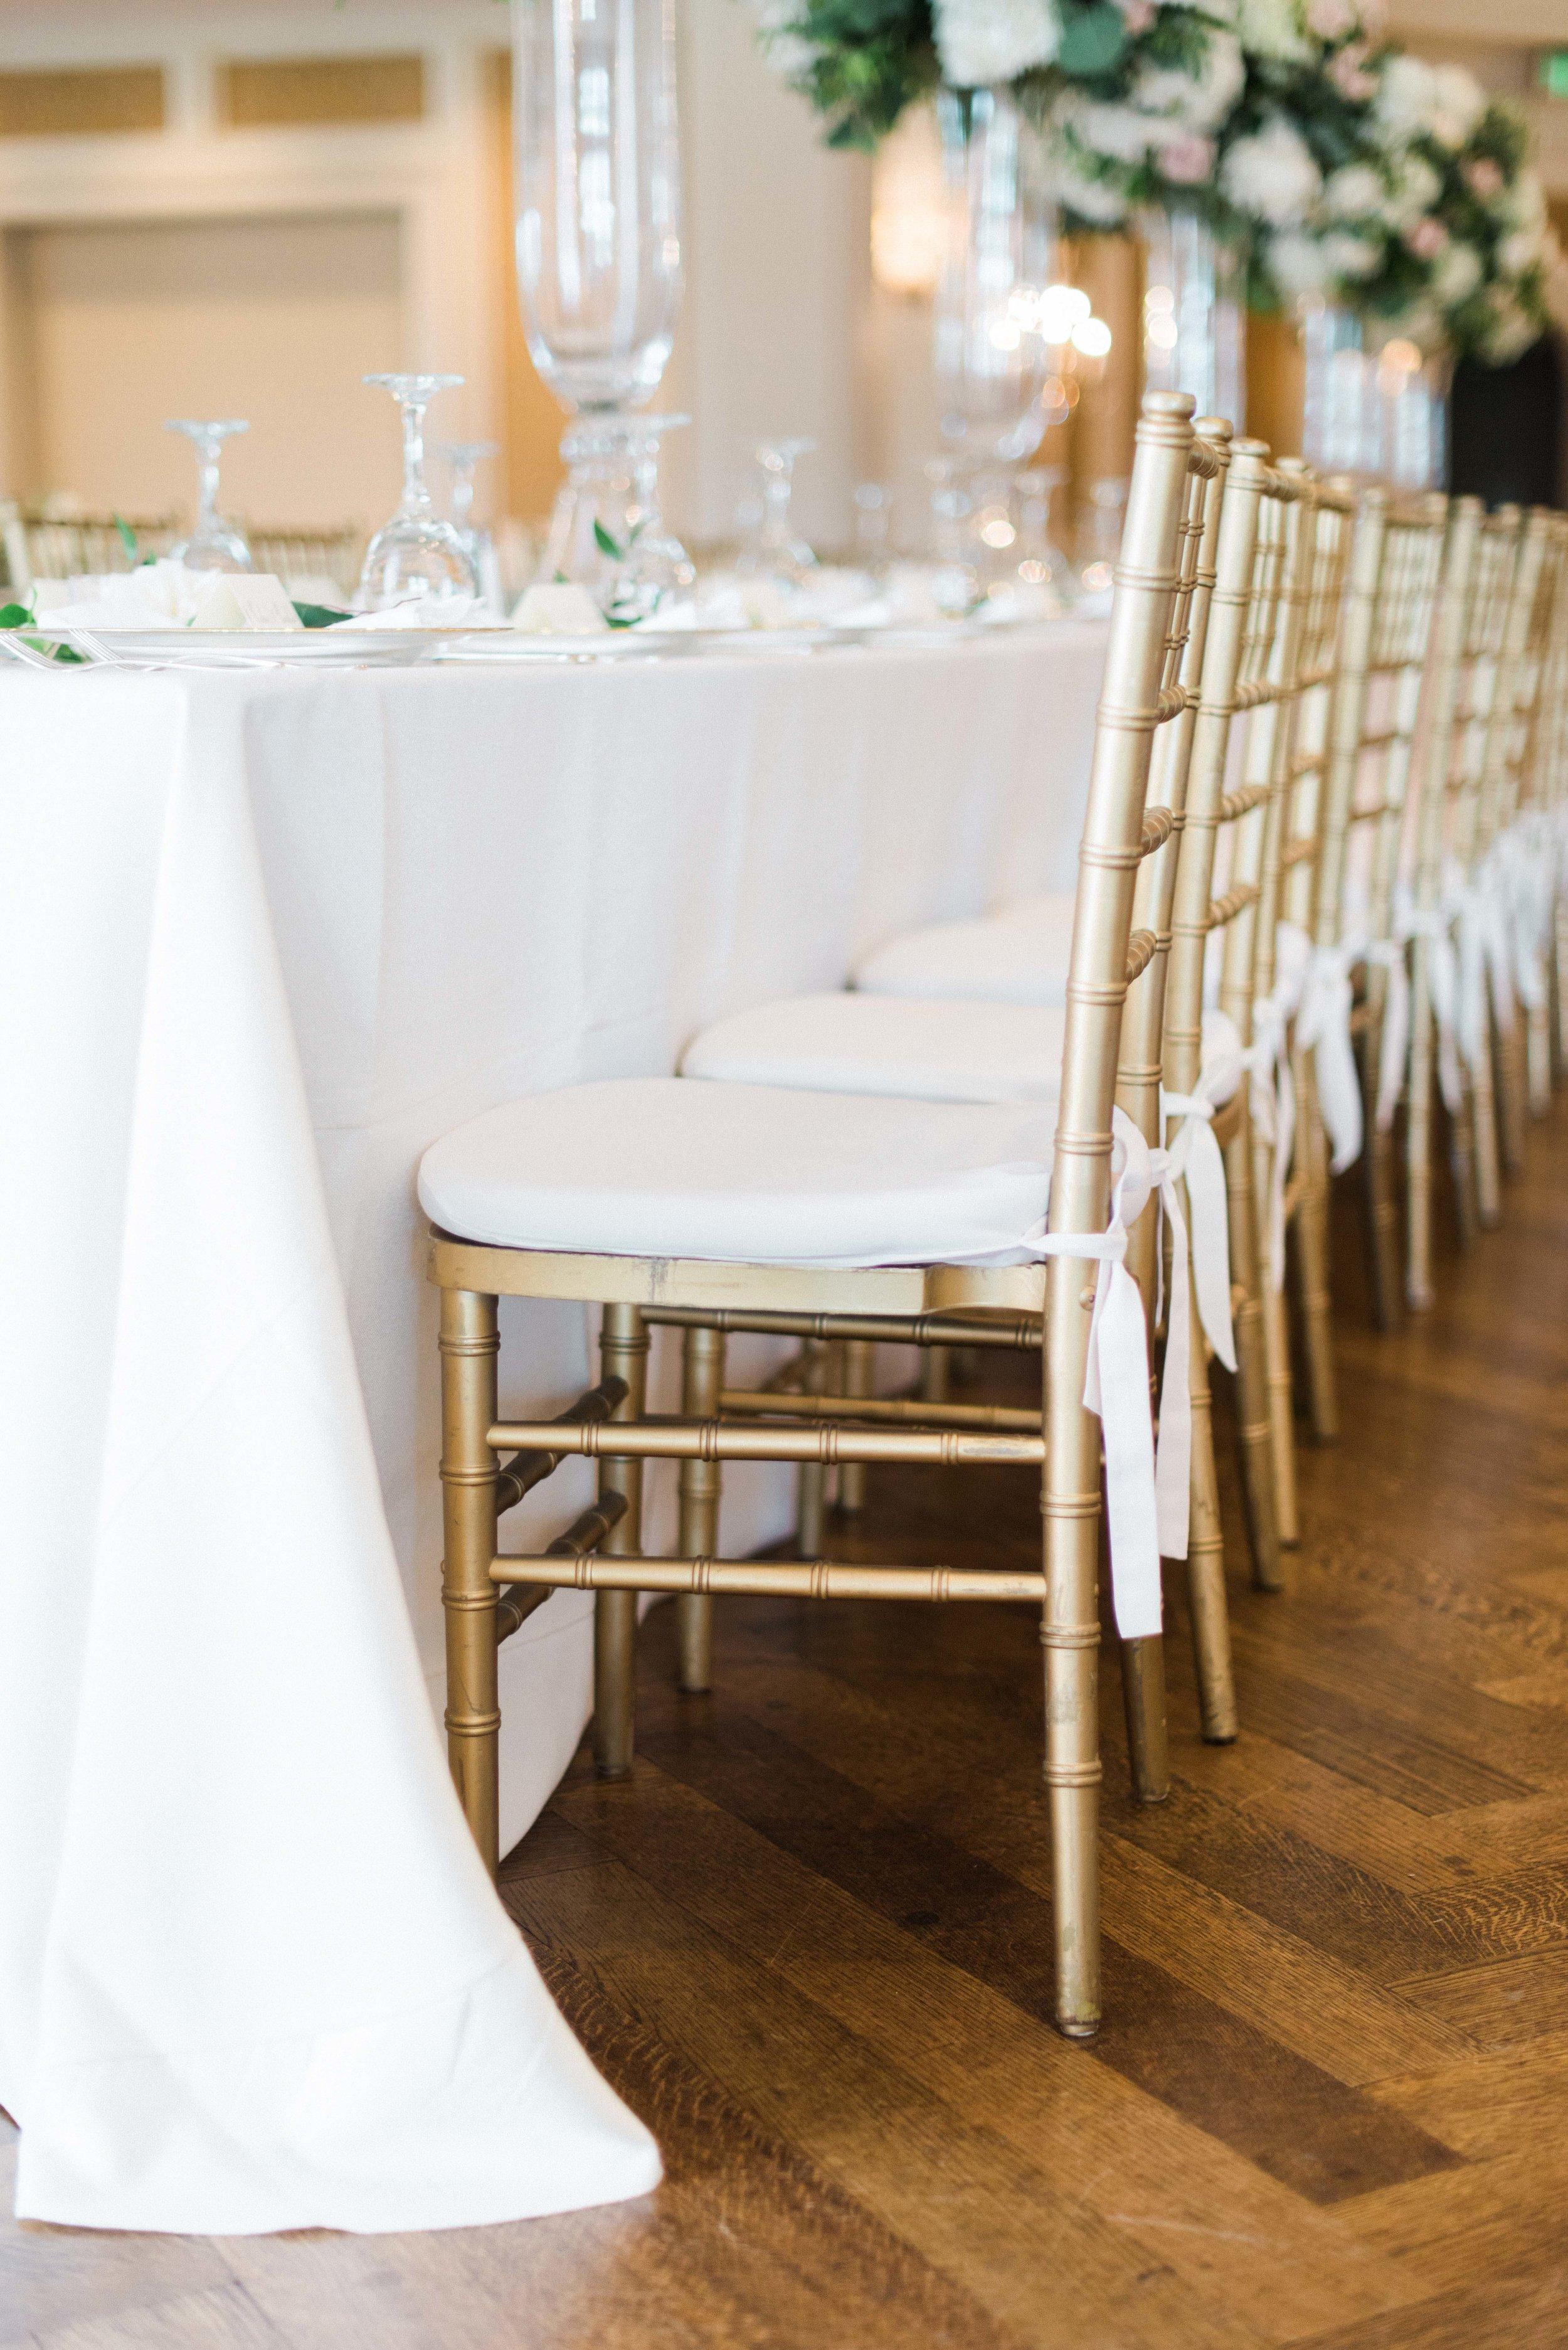 houston-wedding-planner-fine-art-luxury-designer-top-best-destination-austin-dallas-kelly-doonan-events-river-oaks-country-club-21